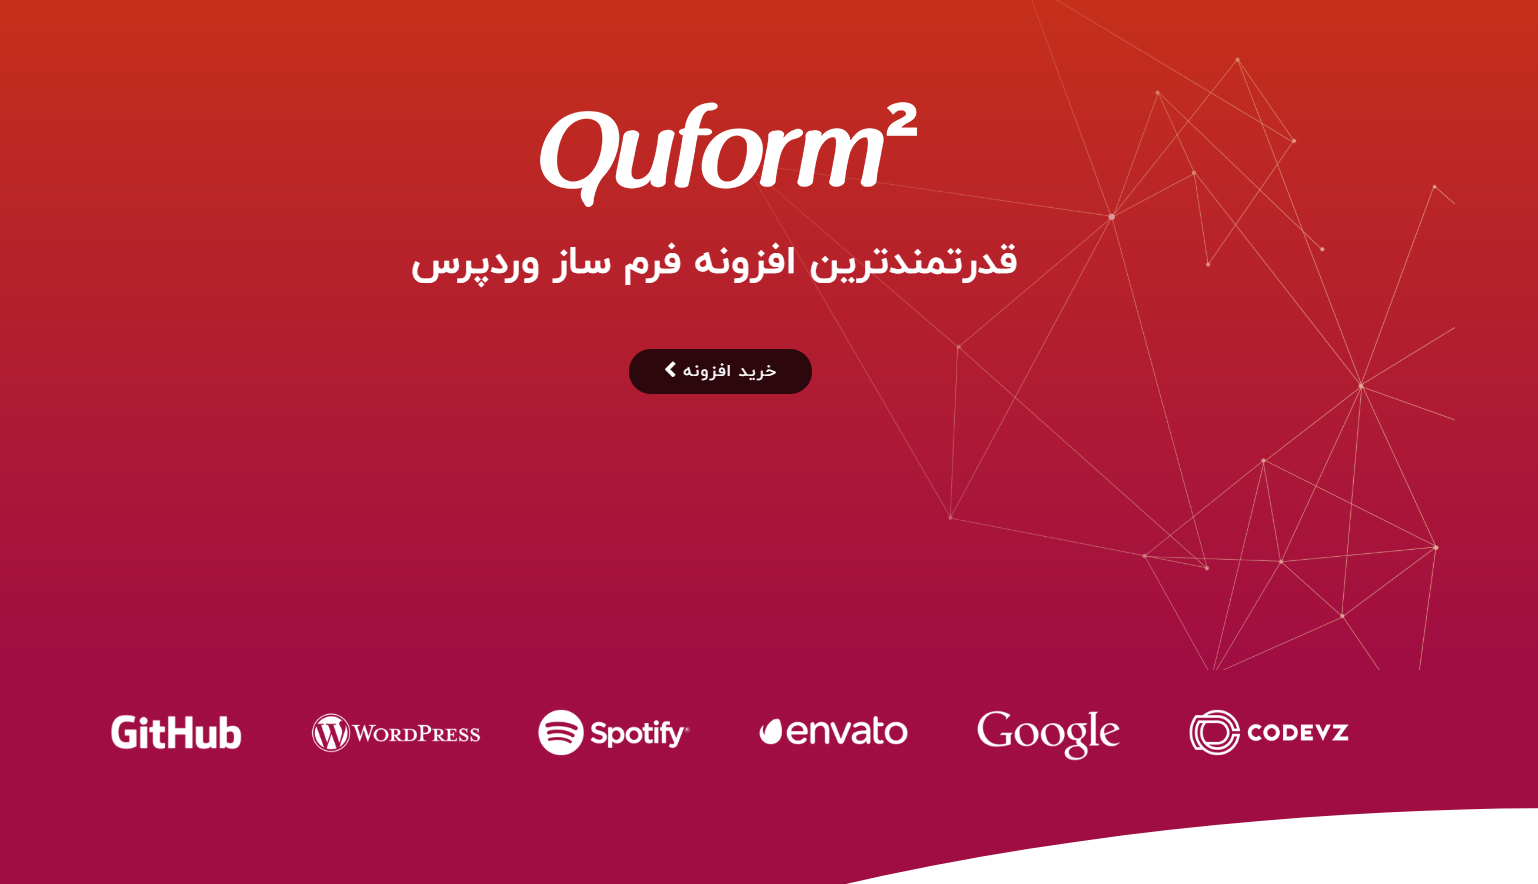 افزونه Quform